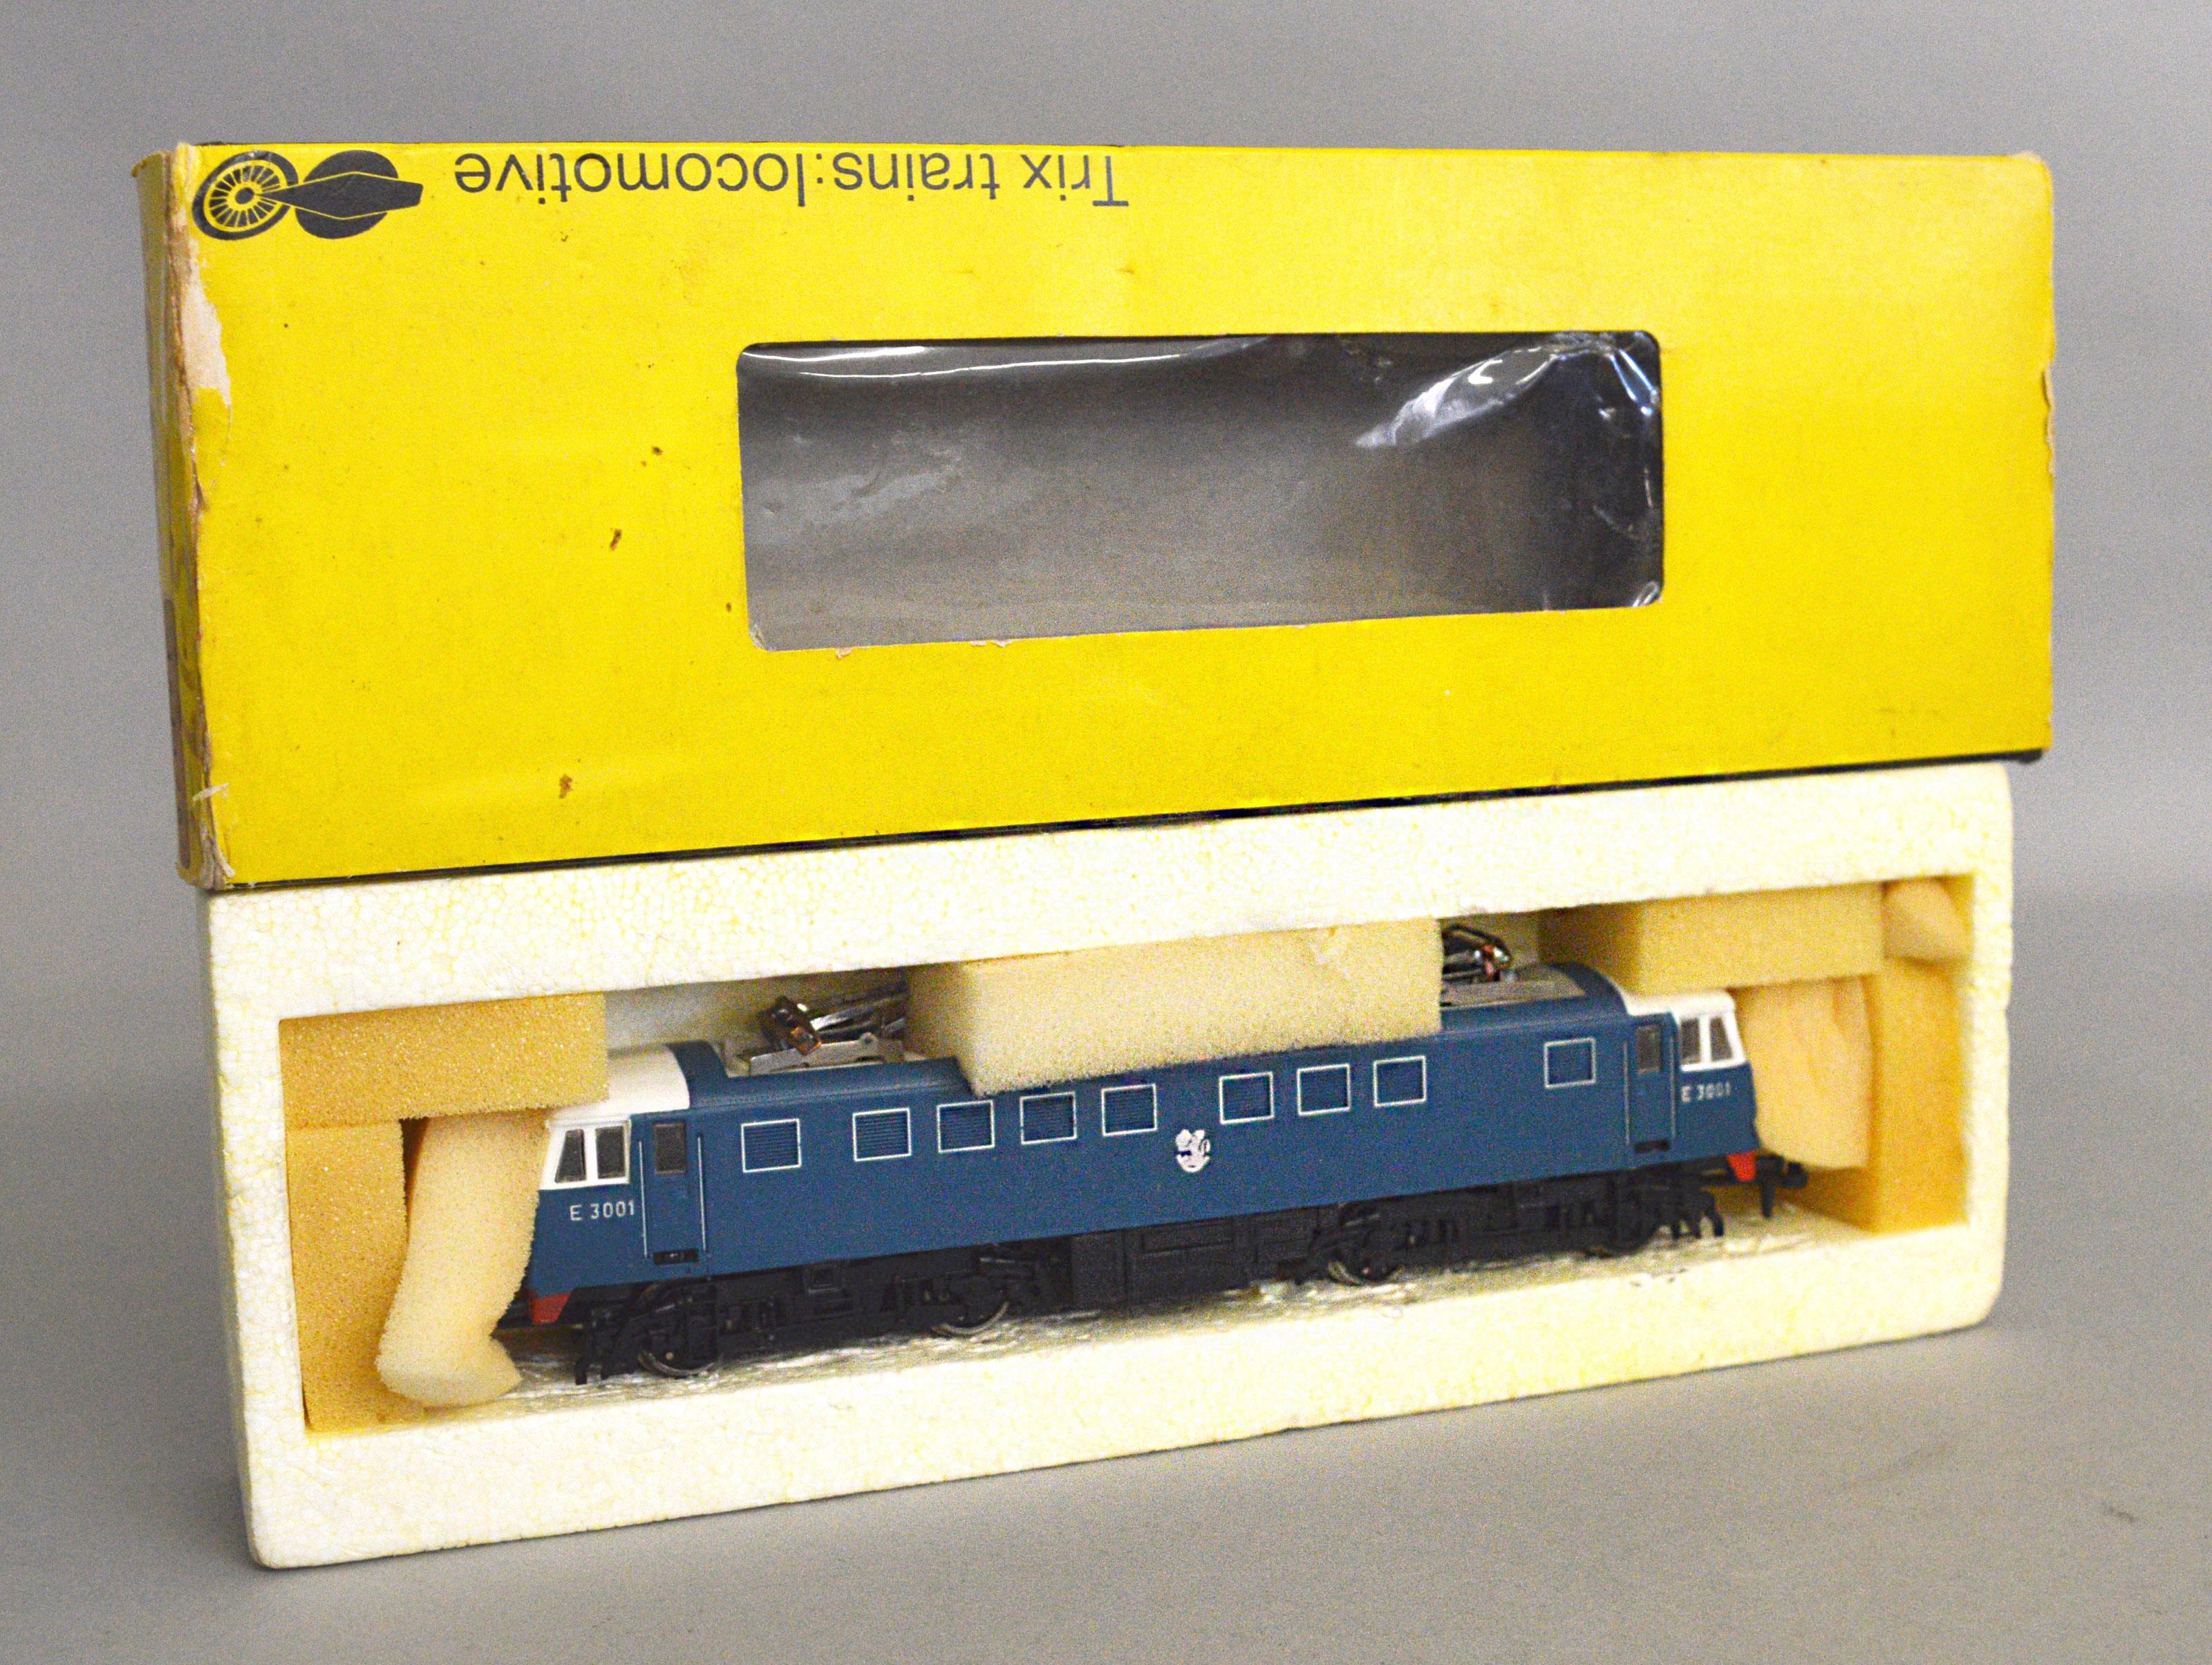 Lot 50 - A boxed Trix Trains #1128 AL1/81 Electric Bo-Bo Locomotive 'E3001' with twin pantographs,